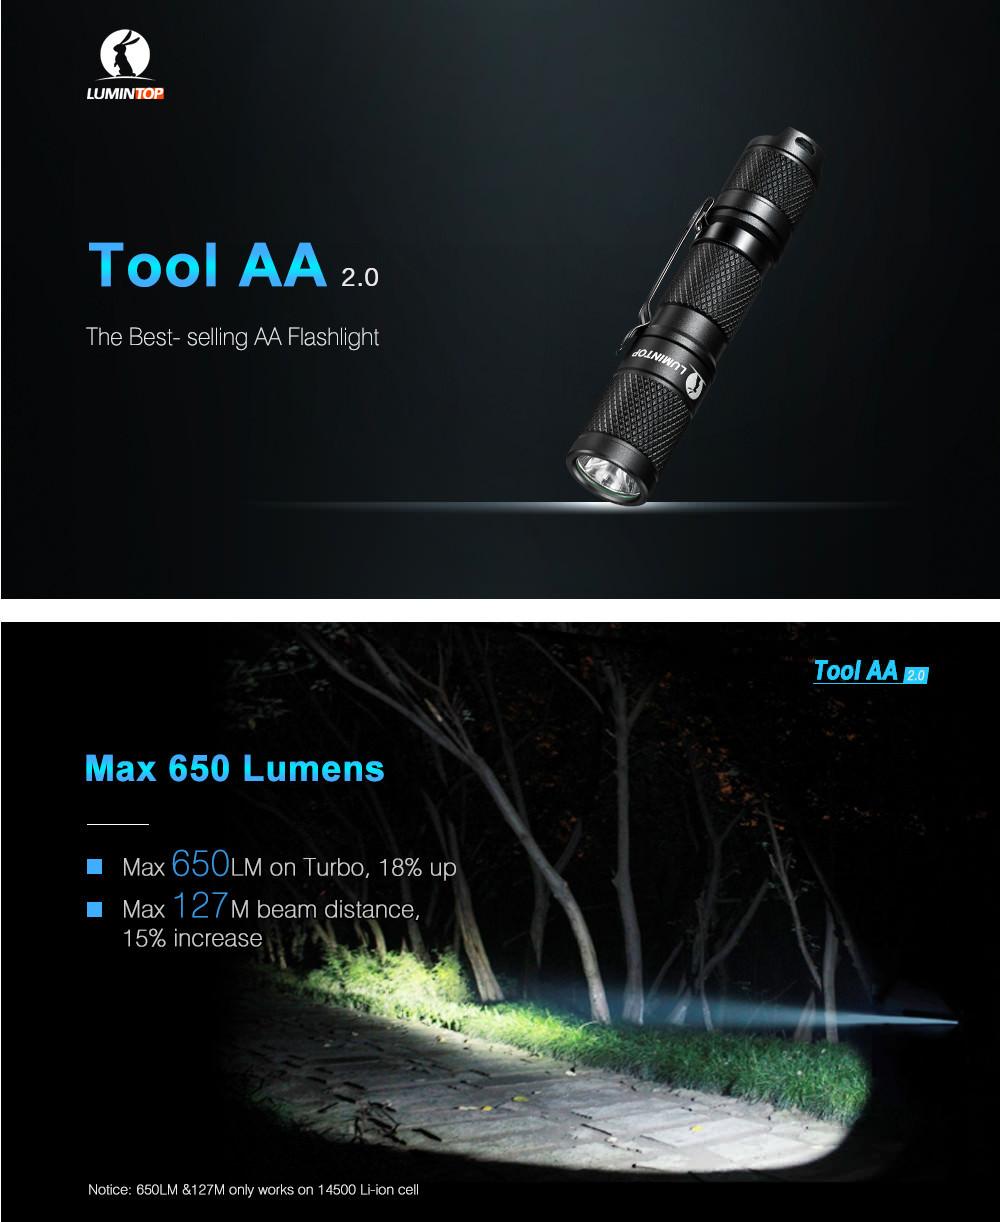 lumintop tool aa 2.0 led flashlight